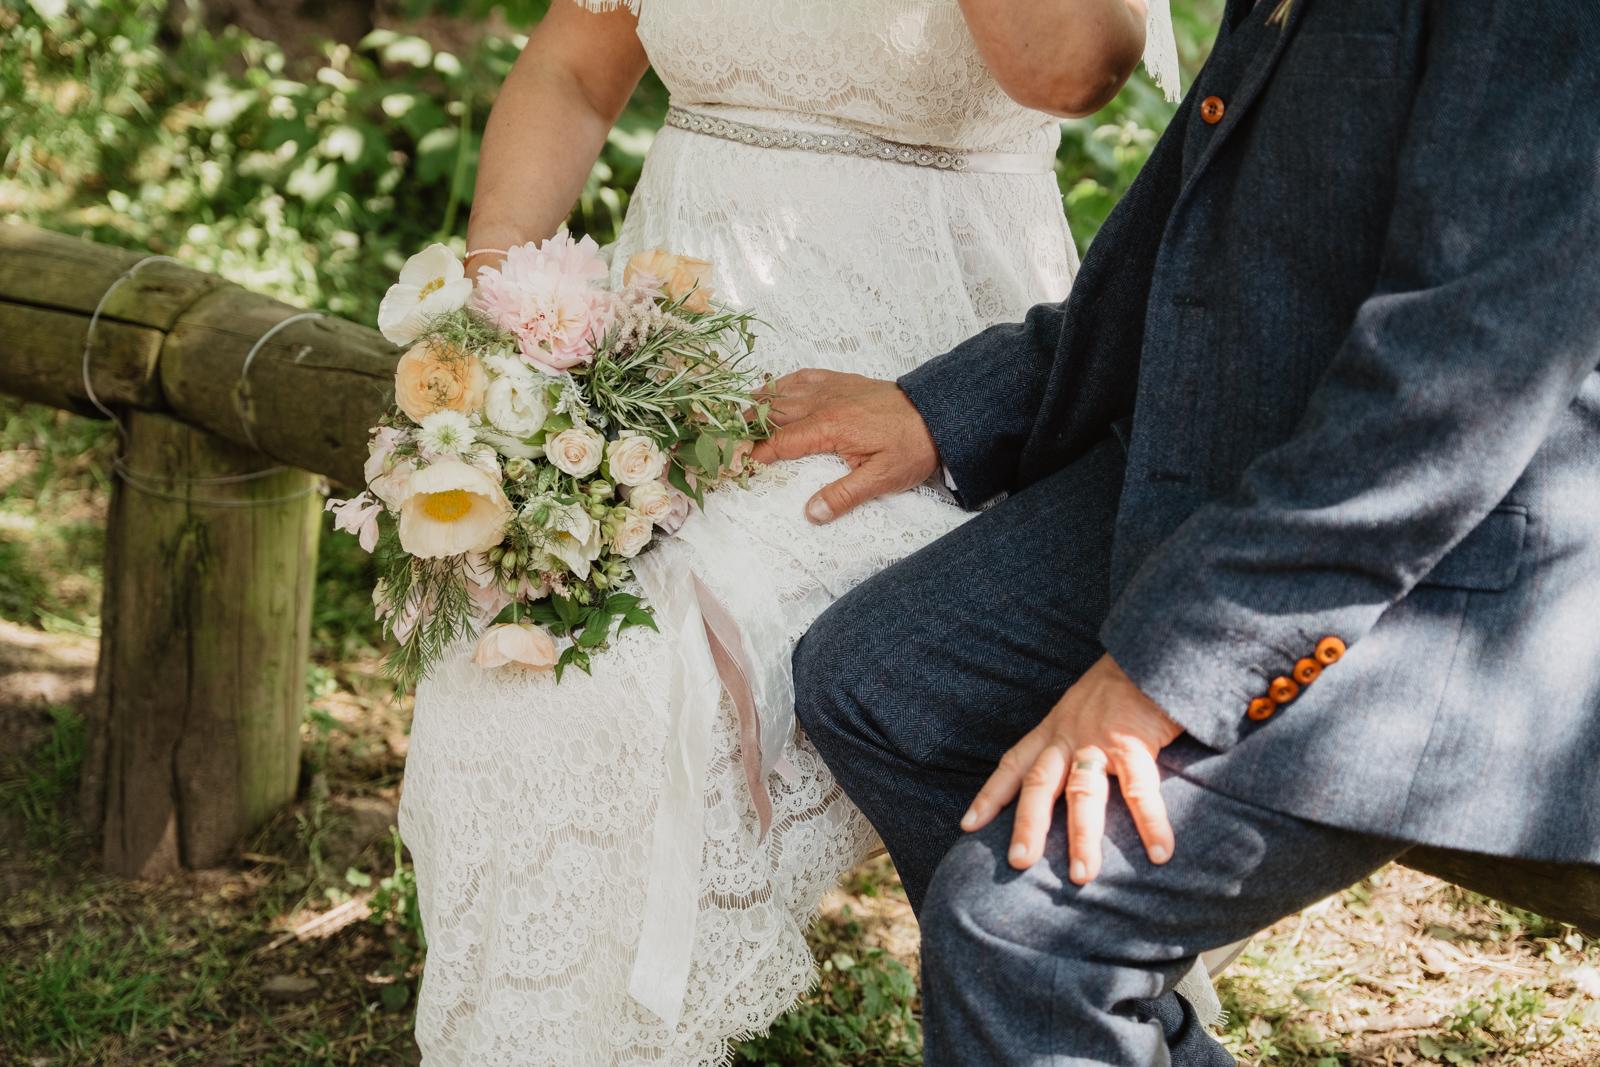 Bridgette-Dahlia-Blush-Silk-Lace-Wedding-Dress-Kate-Beaumont-Sheffield-Ivory-Fayre-20.jpg